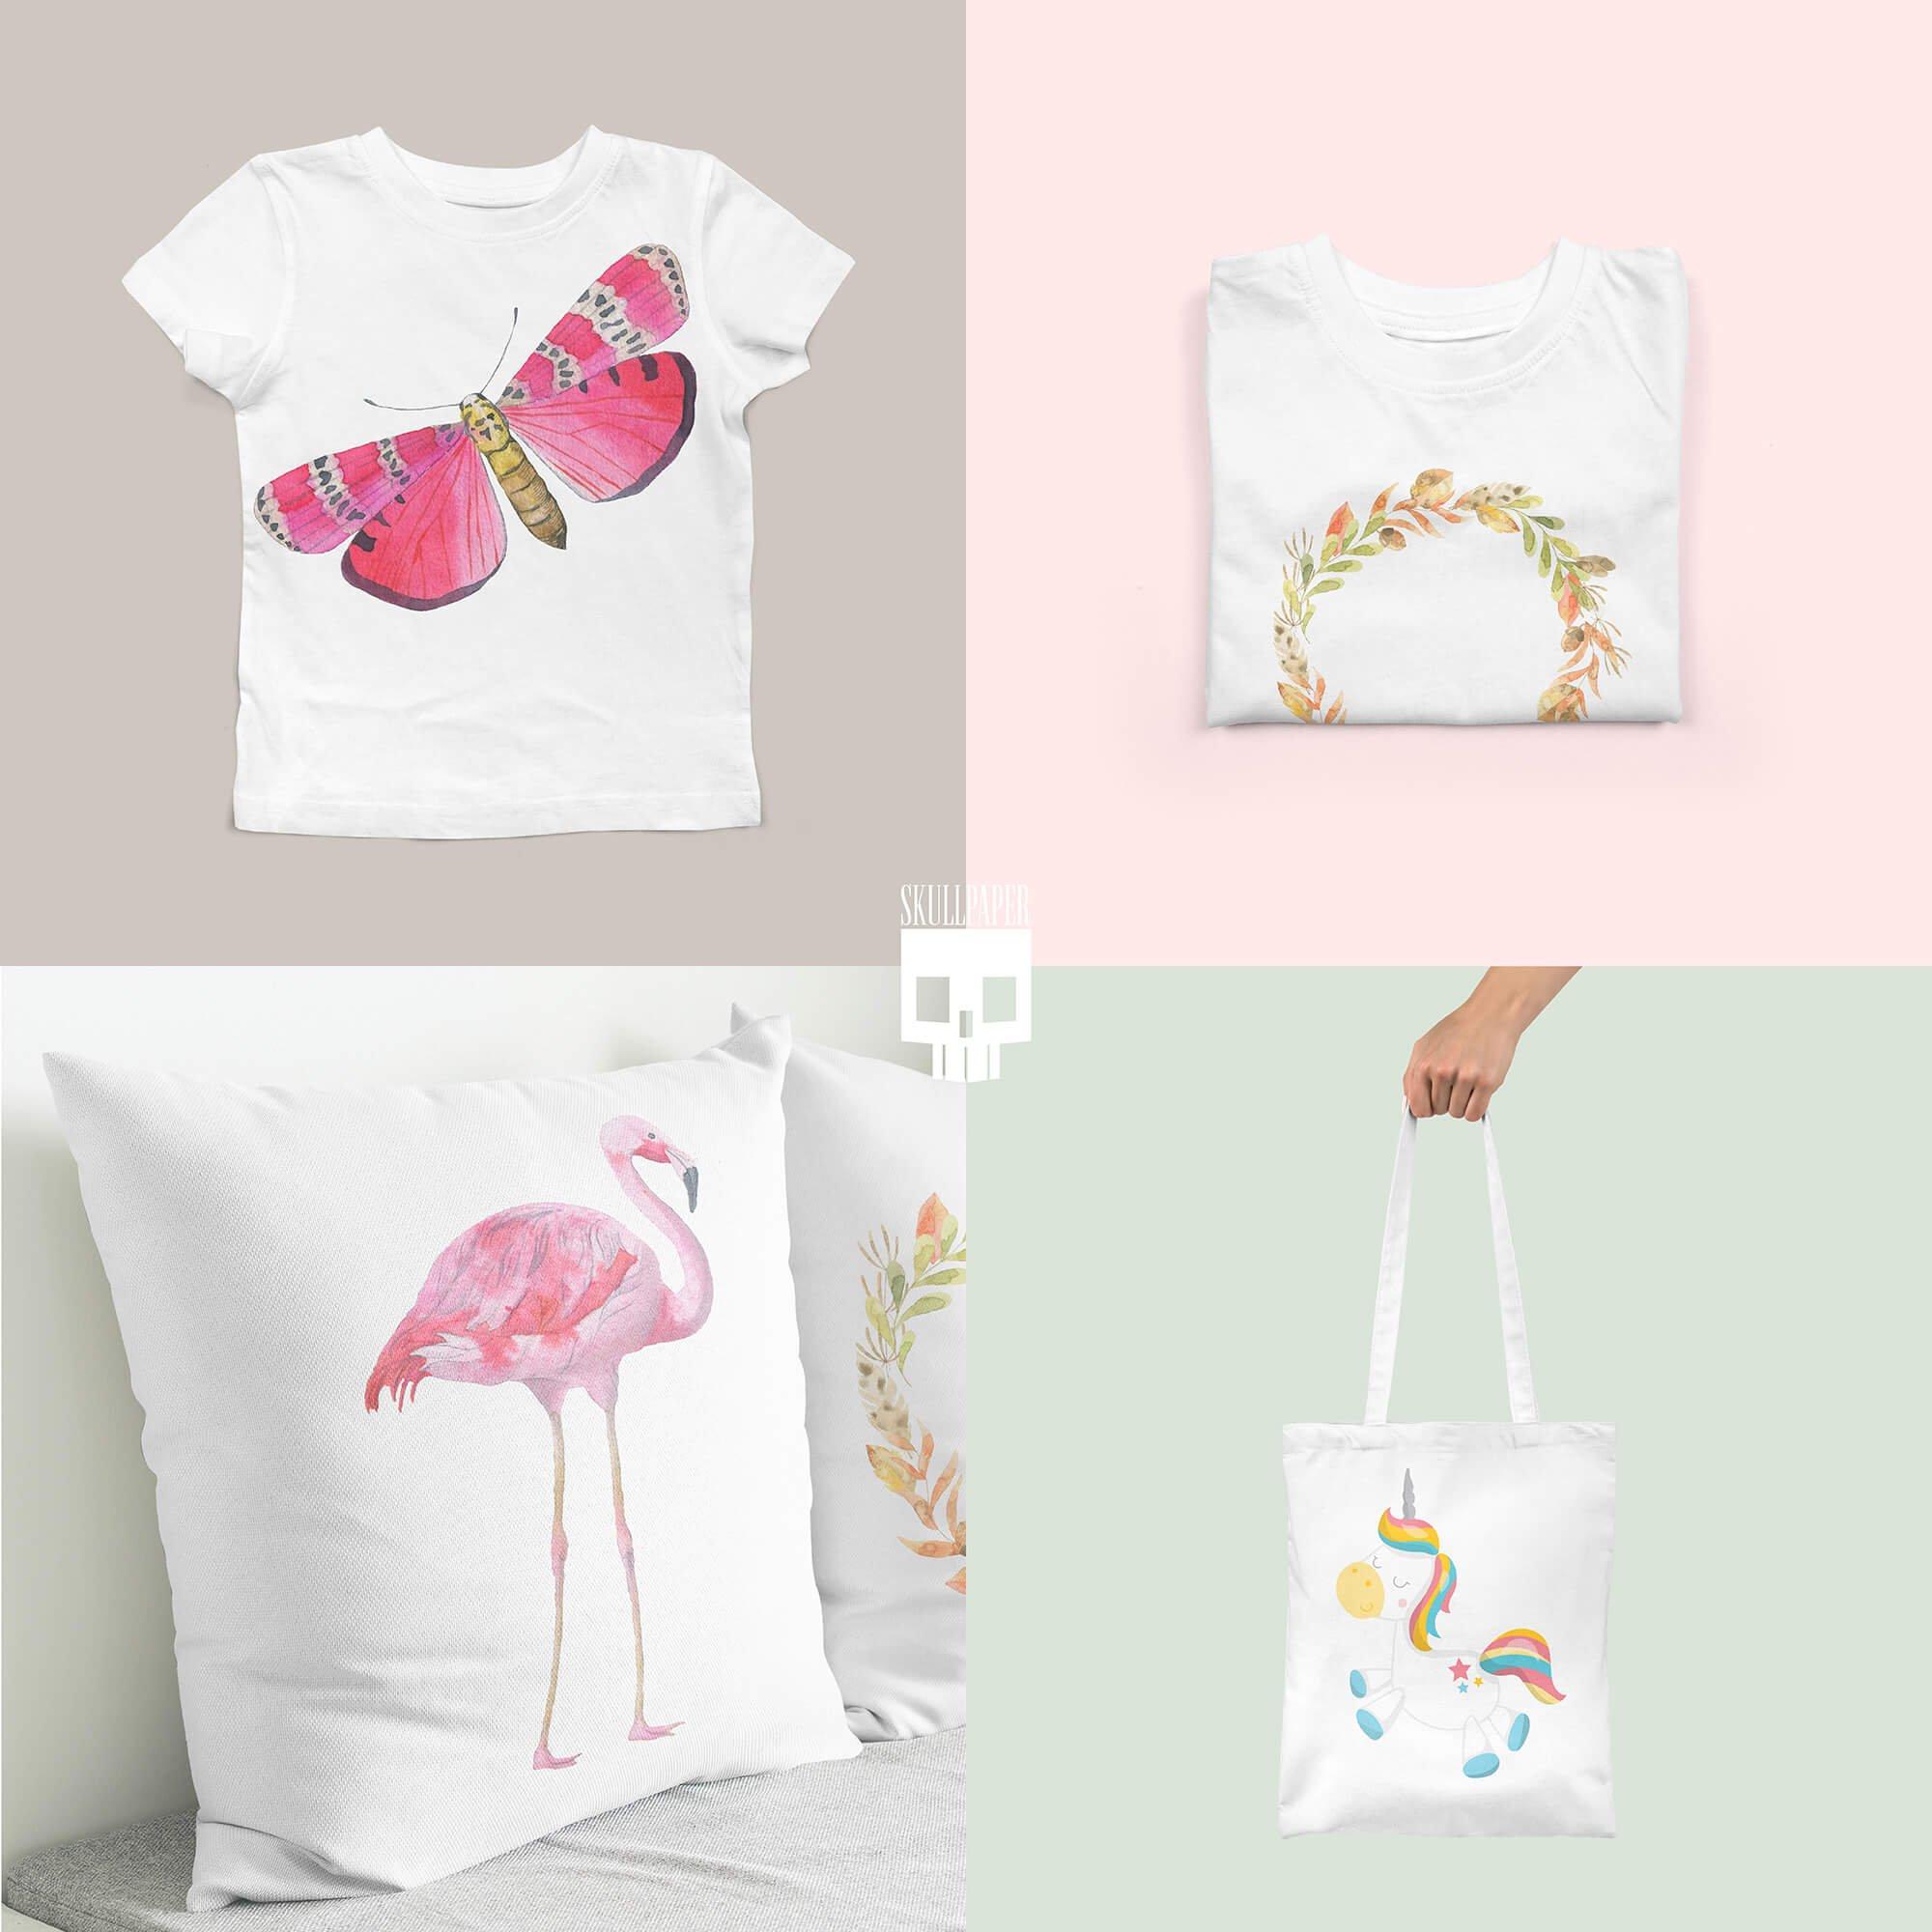 SKULLPAPER Premium película de transferencia textil para camisetas ...